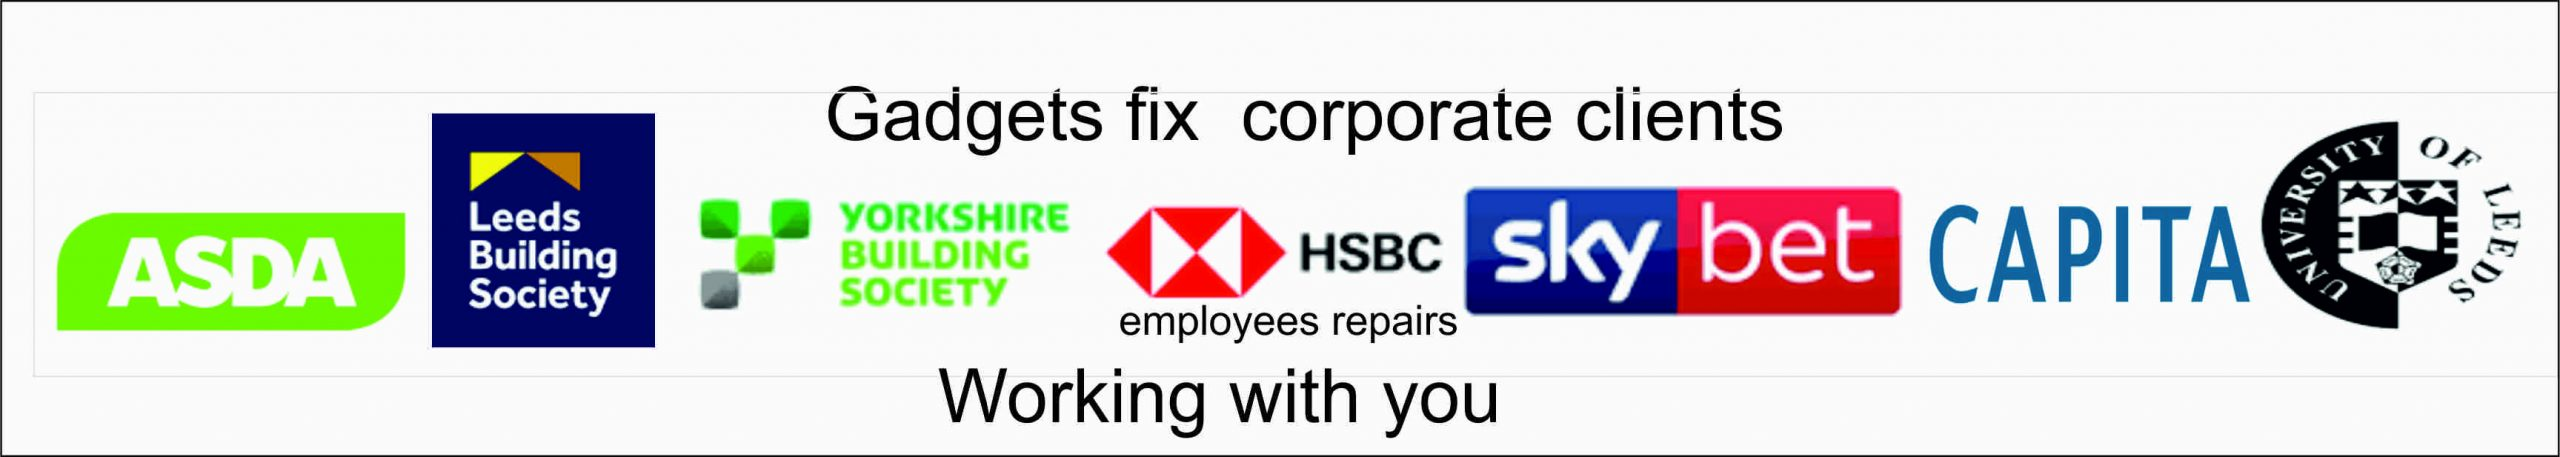 gadgets fix corporate clients